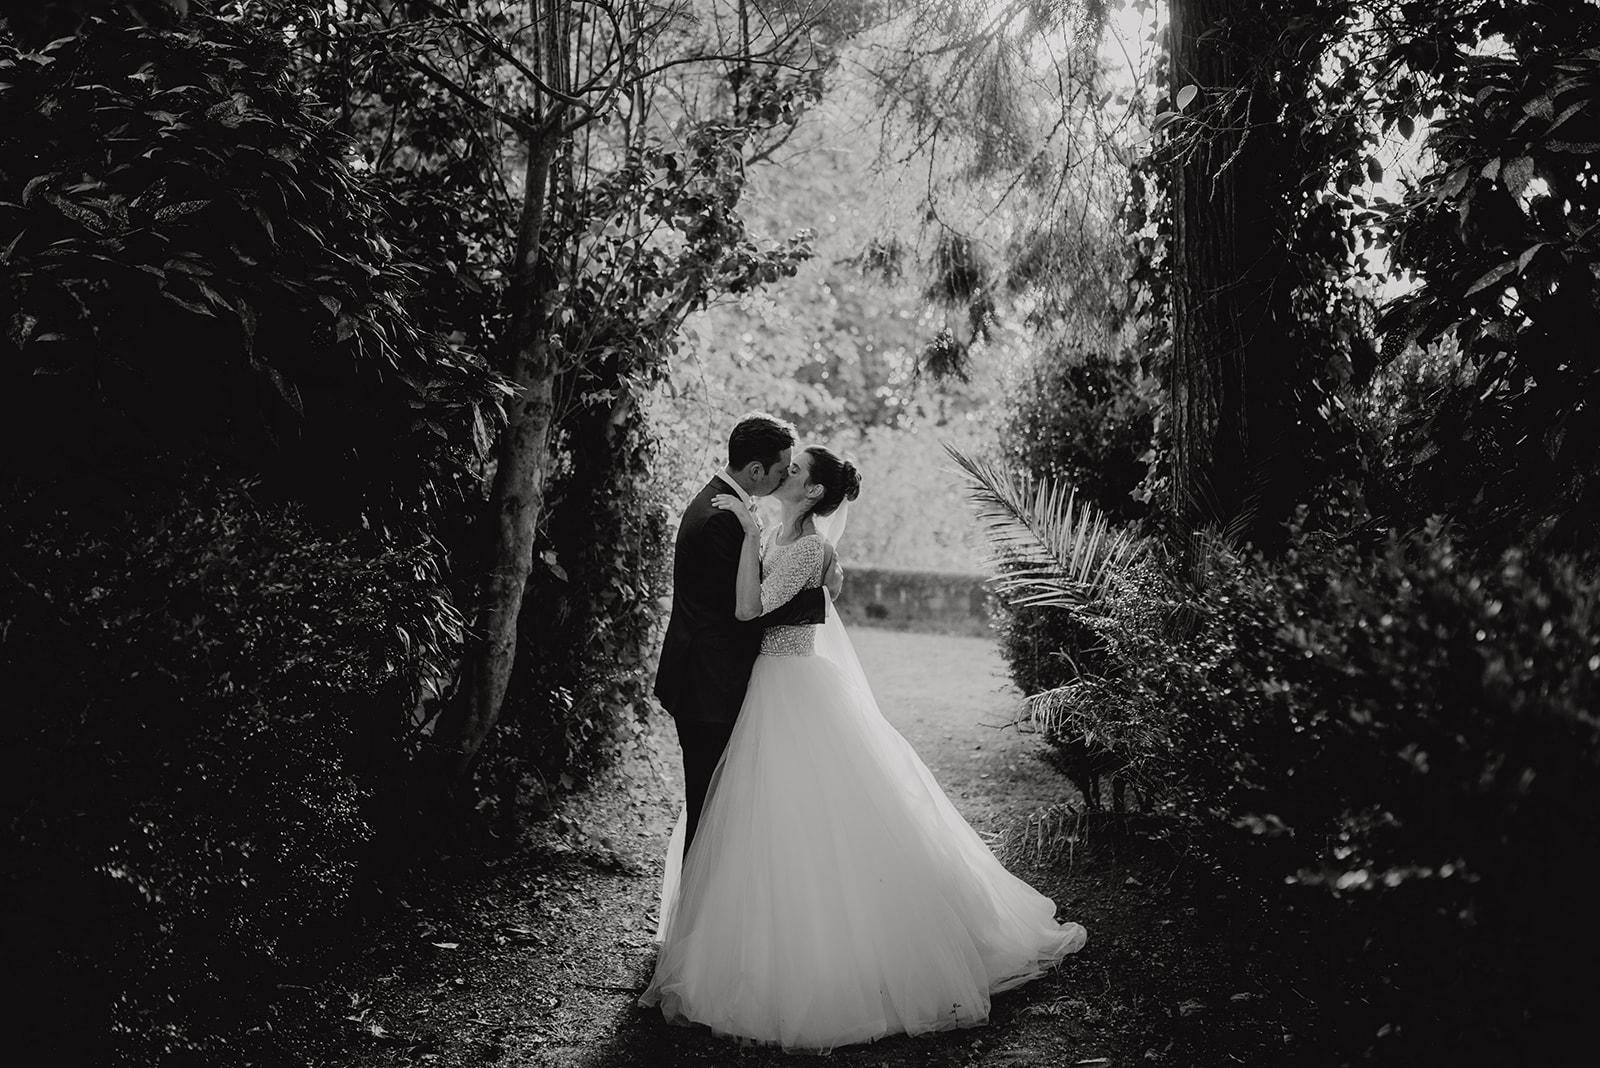 Lapela-photography-wedding-algarve-portugal-best-of-30.jpg